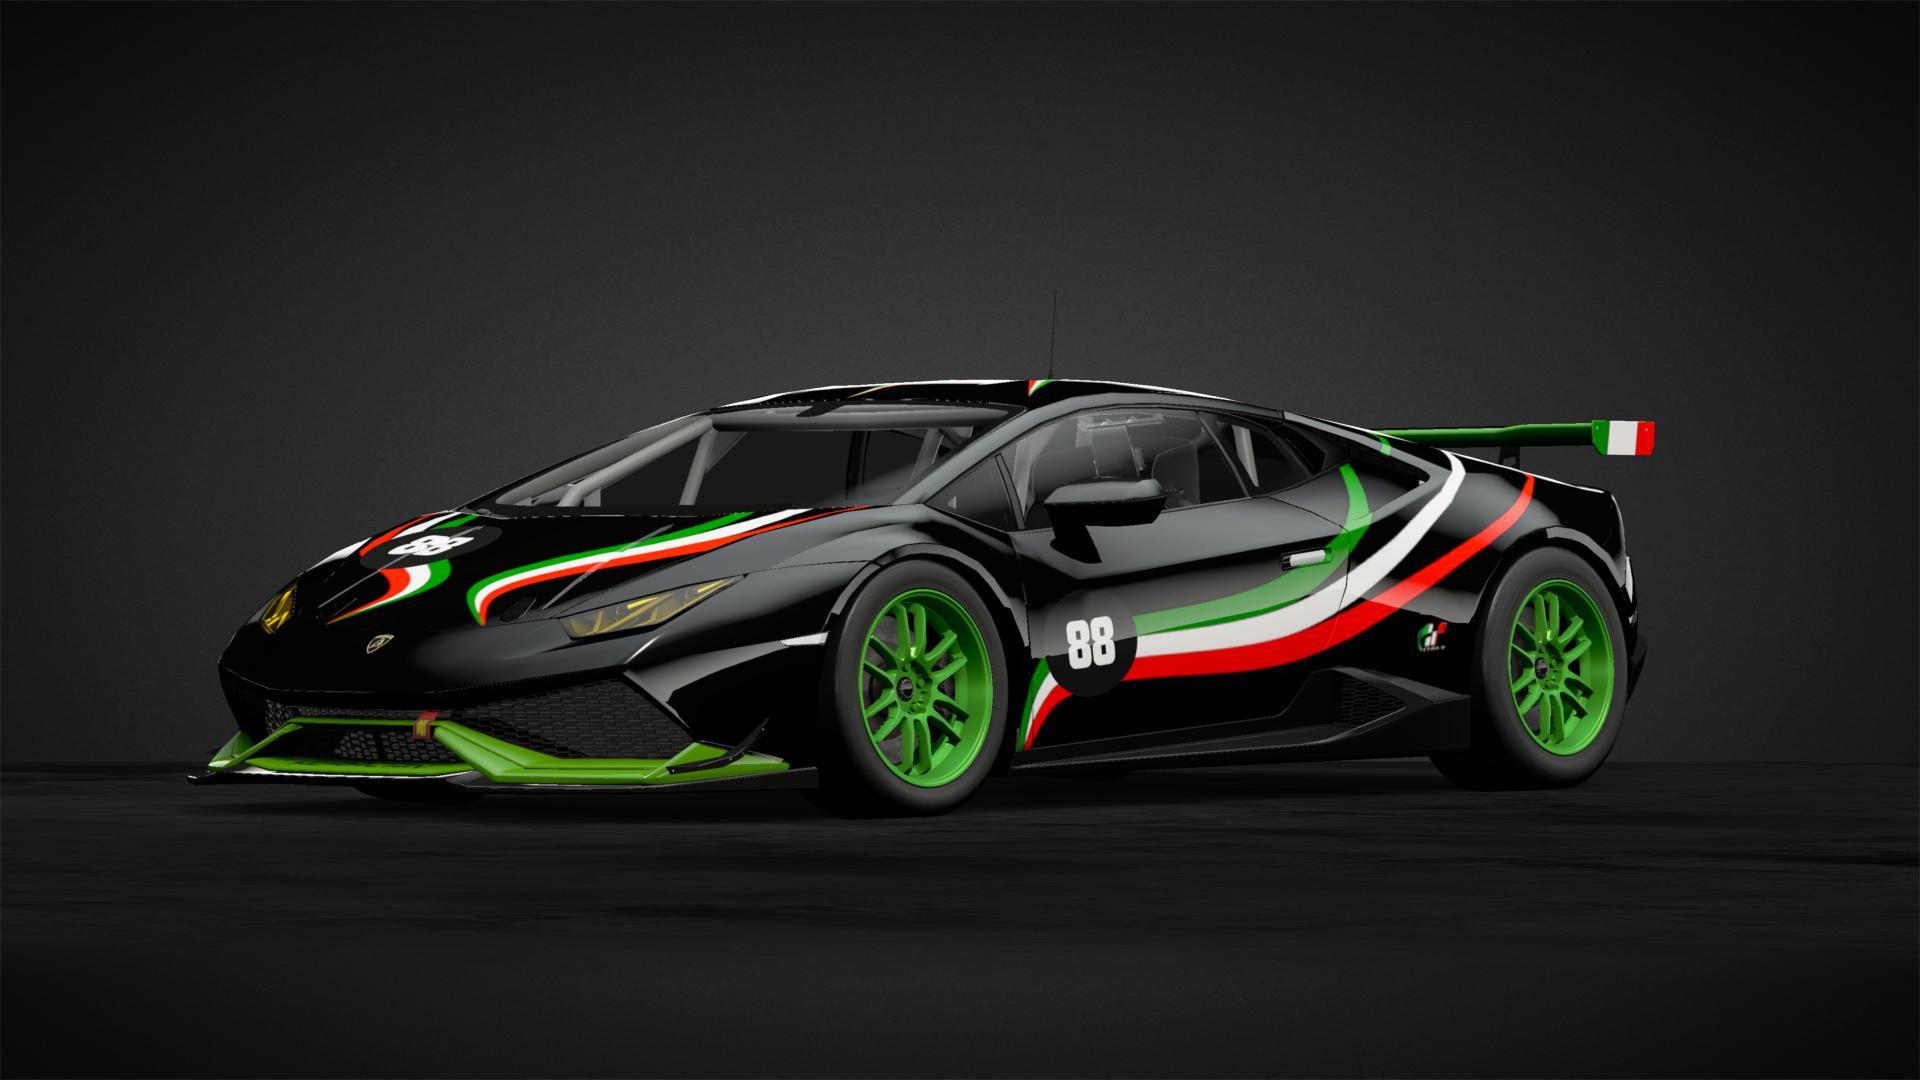 Lambo GT Italia Car Livery by Demonicdoctor500 | Community